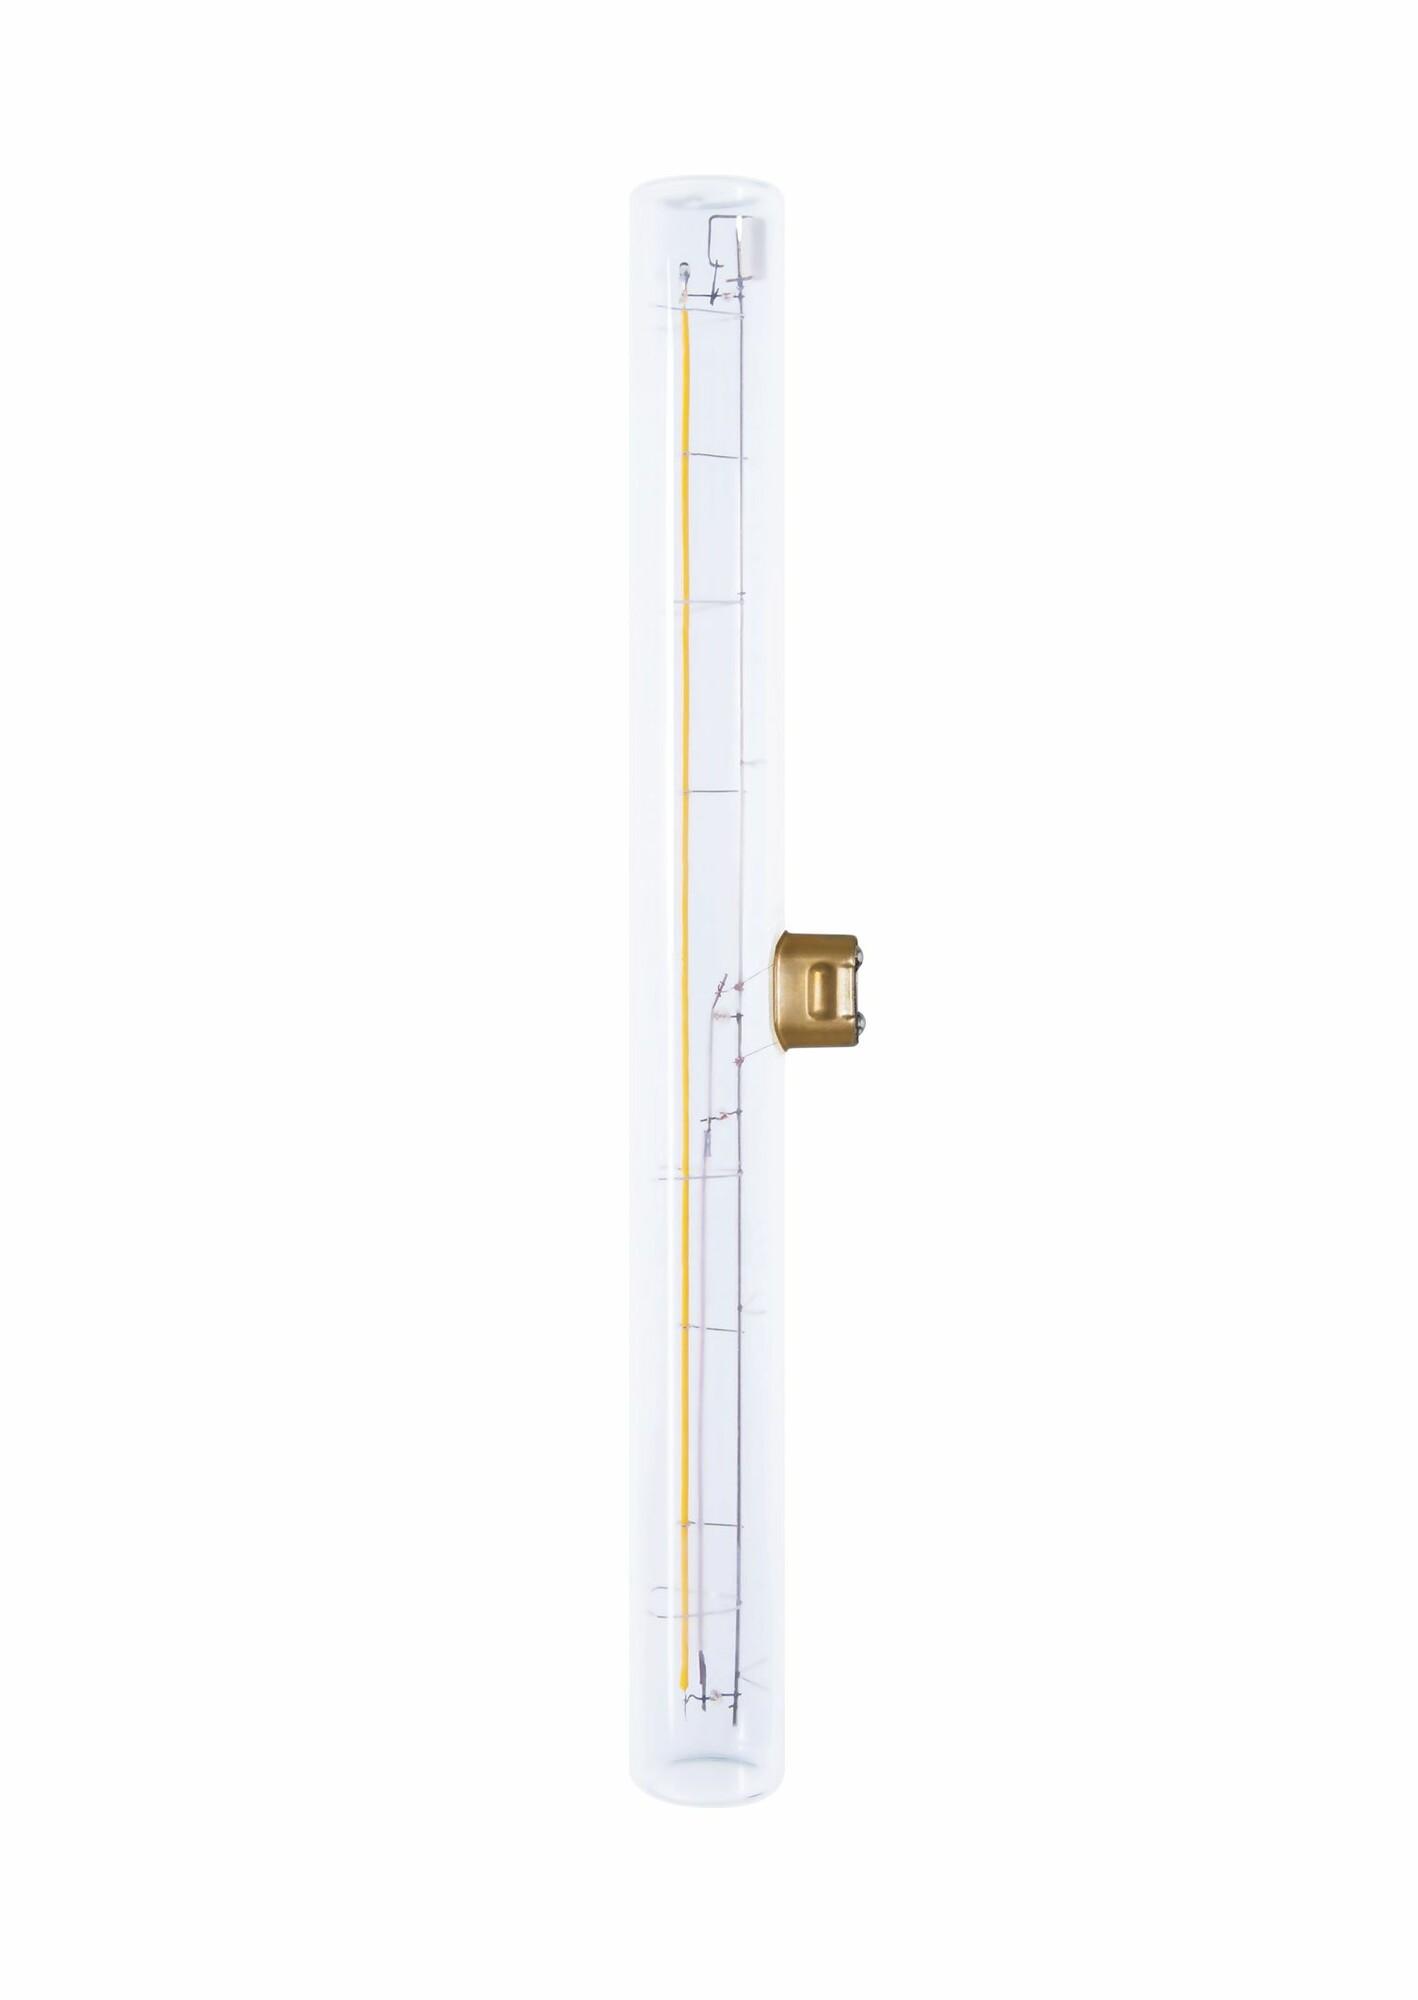 Deco Linear S14D 8W 330lm 2200K Tube Transparant